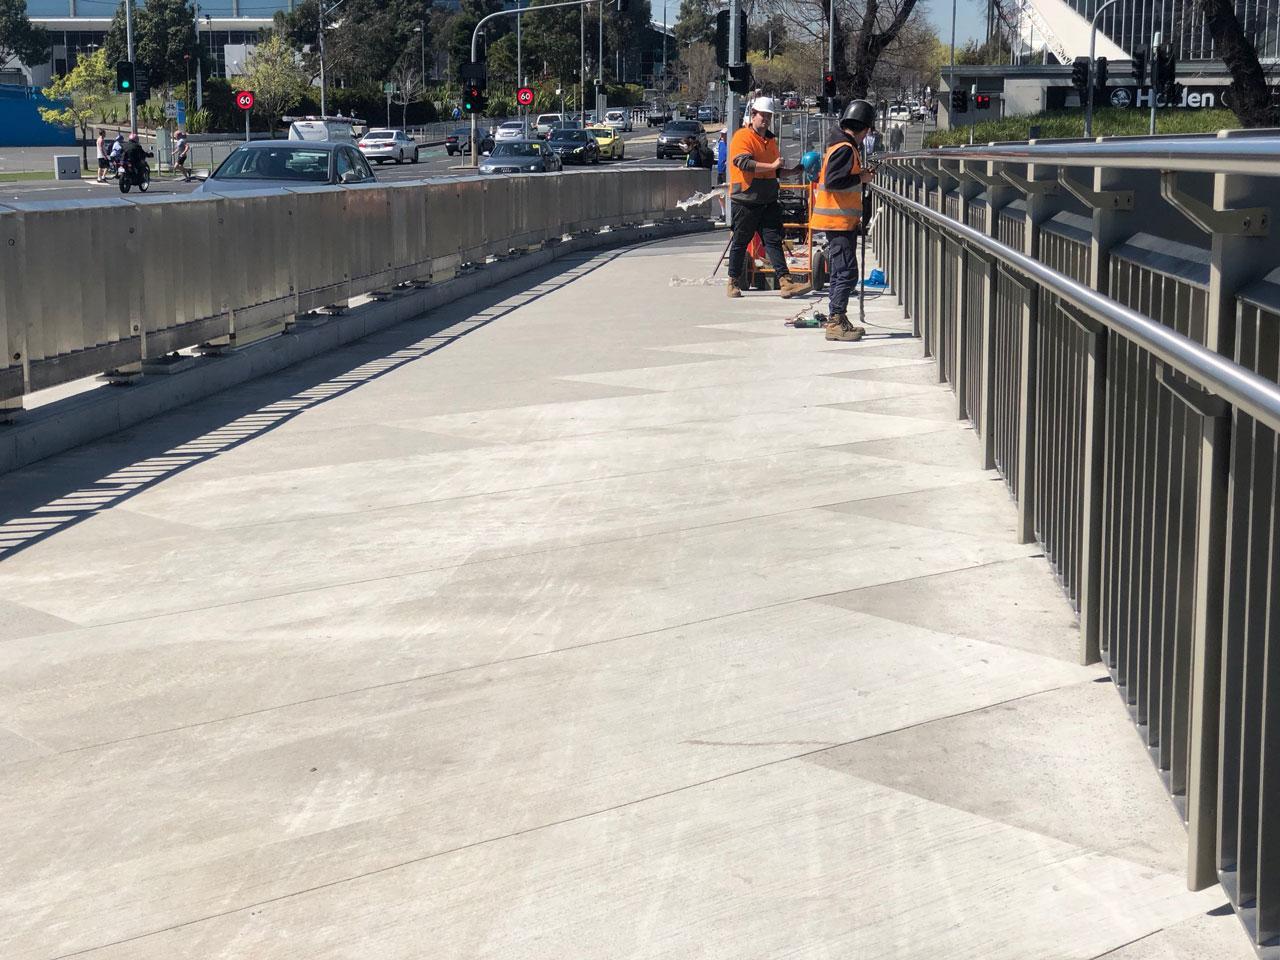 IMG_8368-Mechcon-Handrails-and-Balustrades-Melbourne-Victoria-Swan-Street-Widening-1280x960